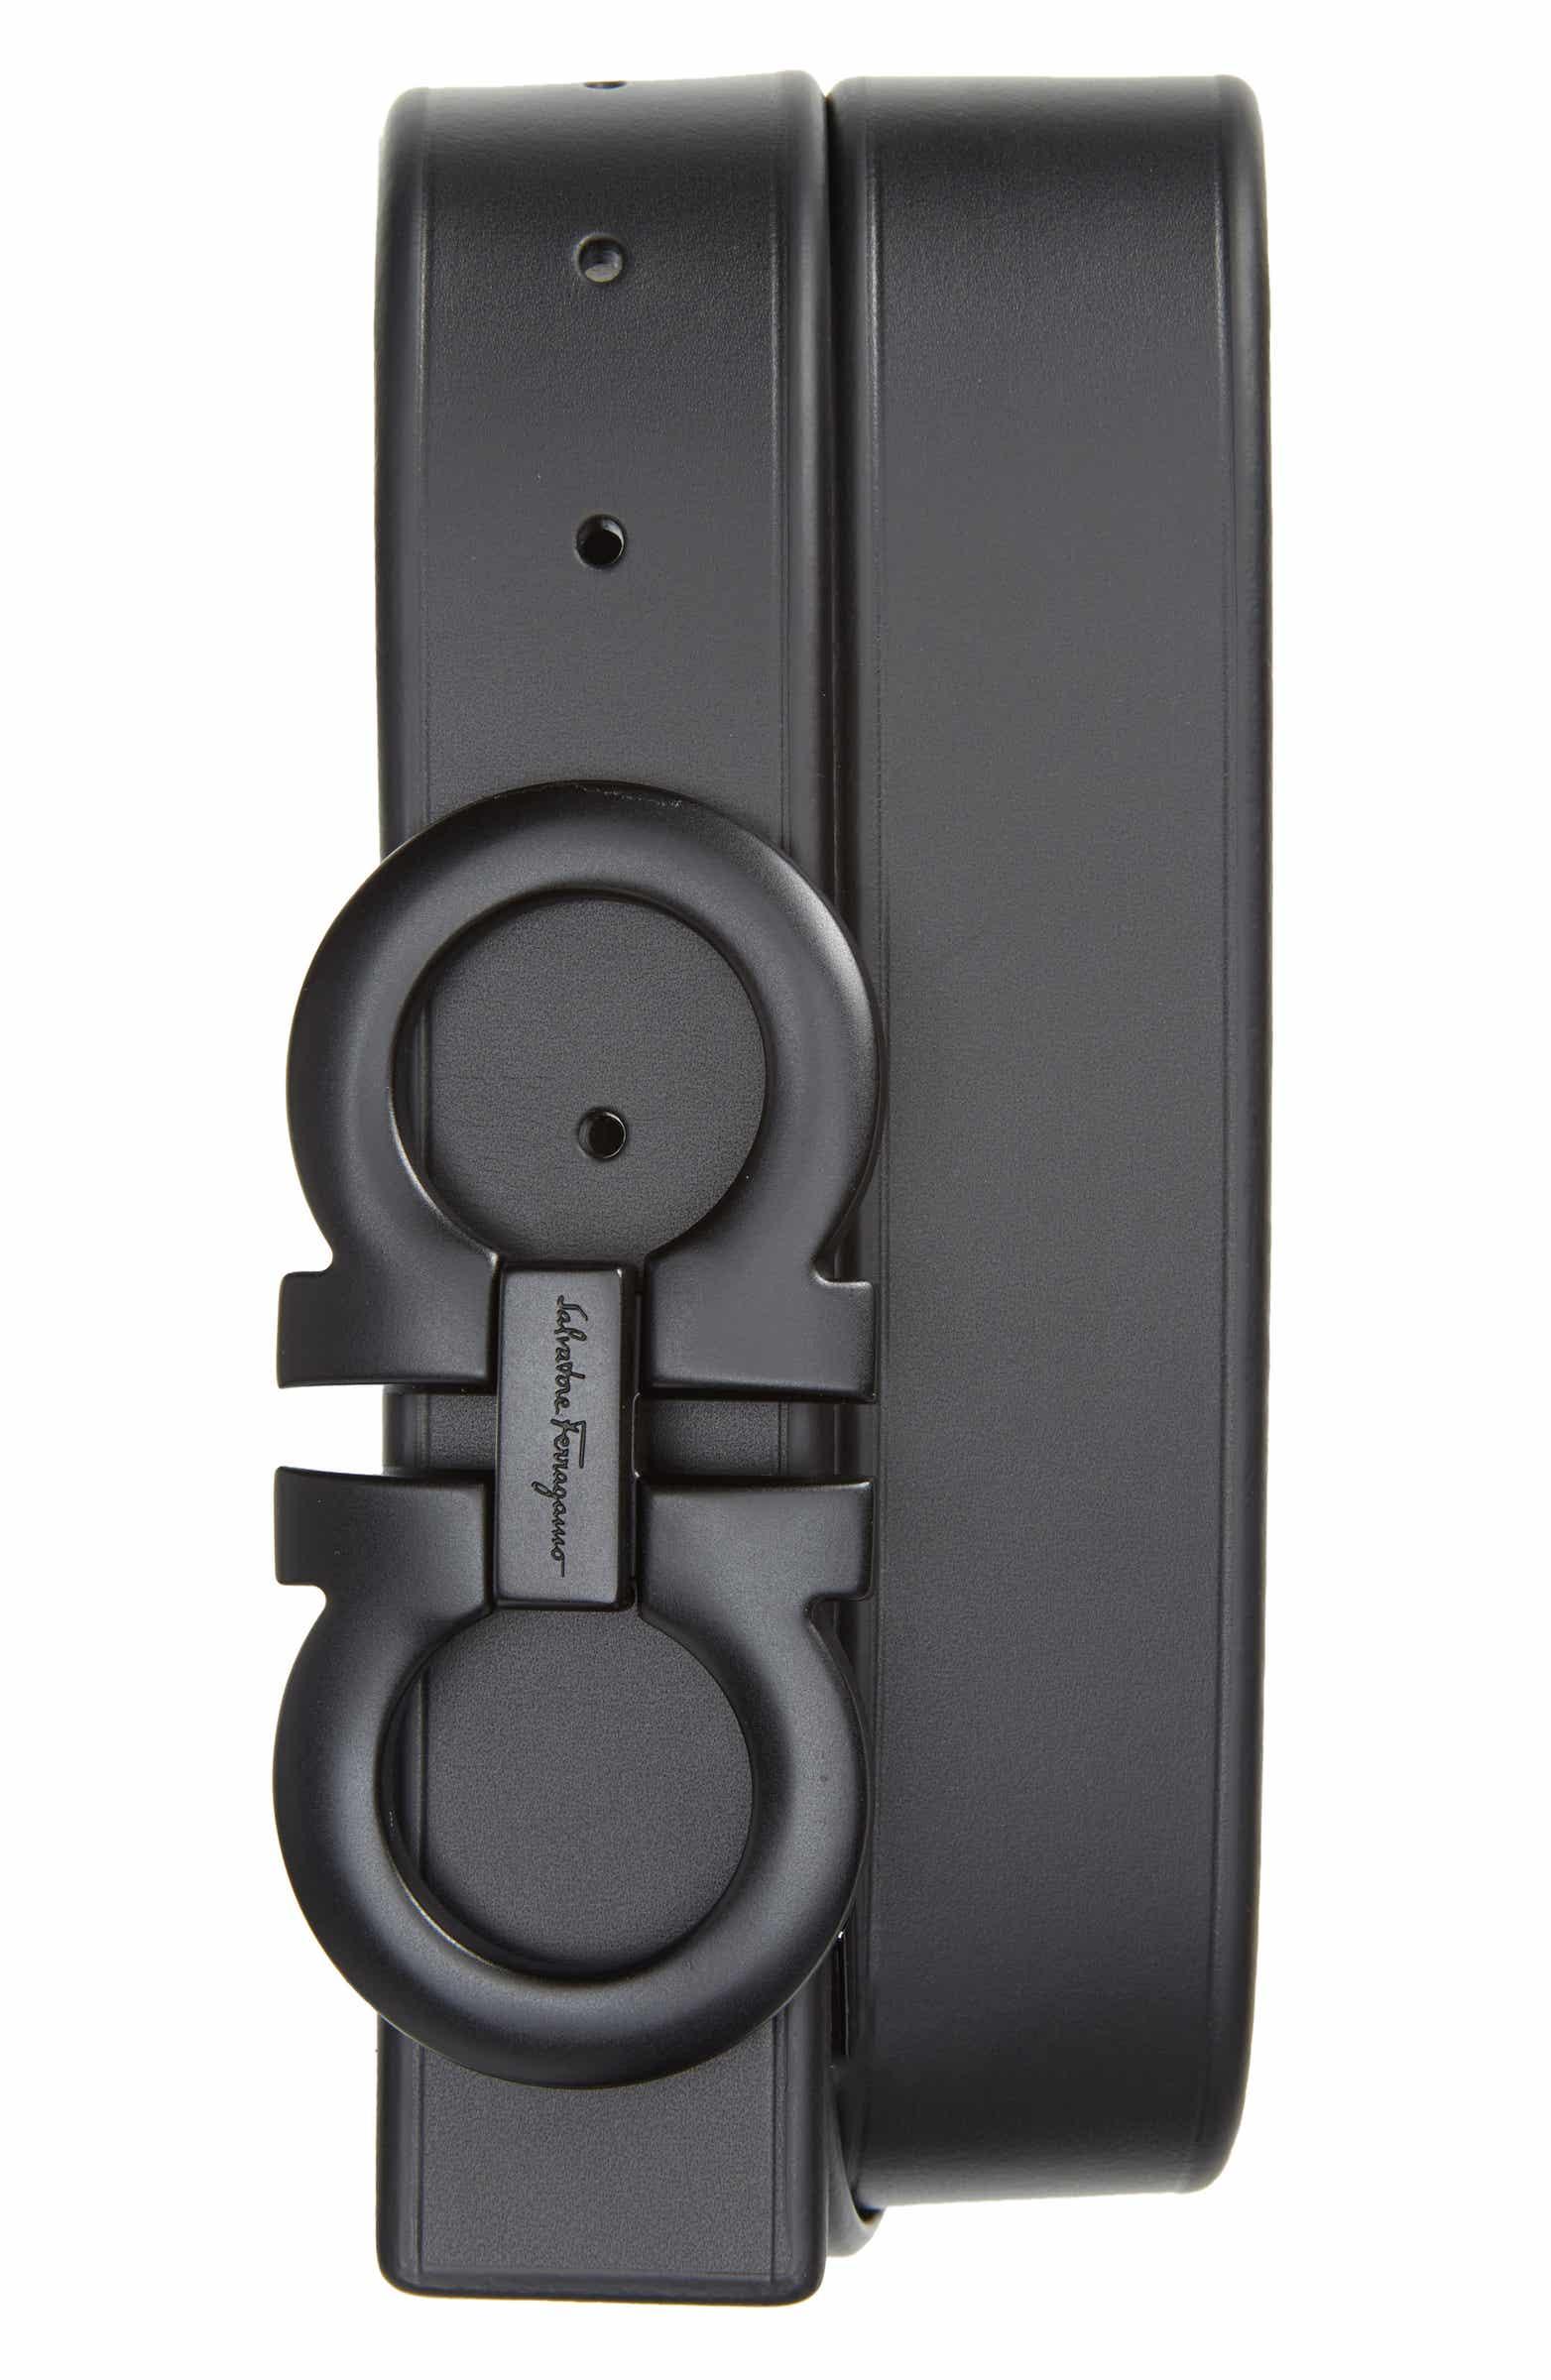 03399c1d92 TrendBrew | Unknown | Men's Ratchet Click Belt,SUOSDEY Leather Dress ...